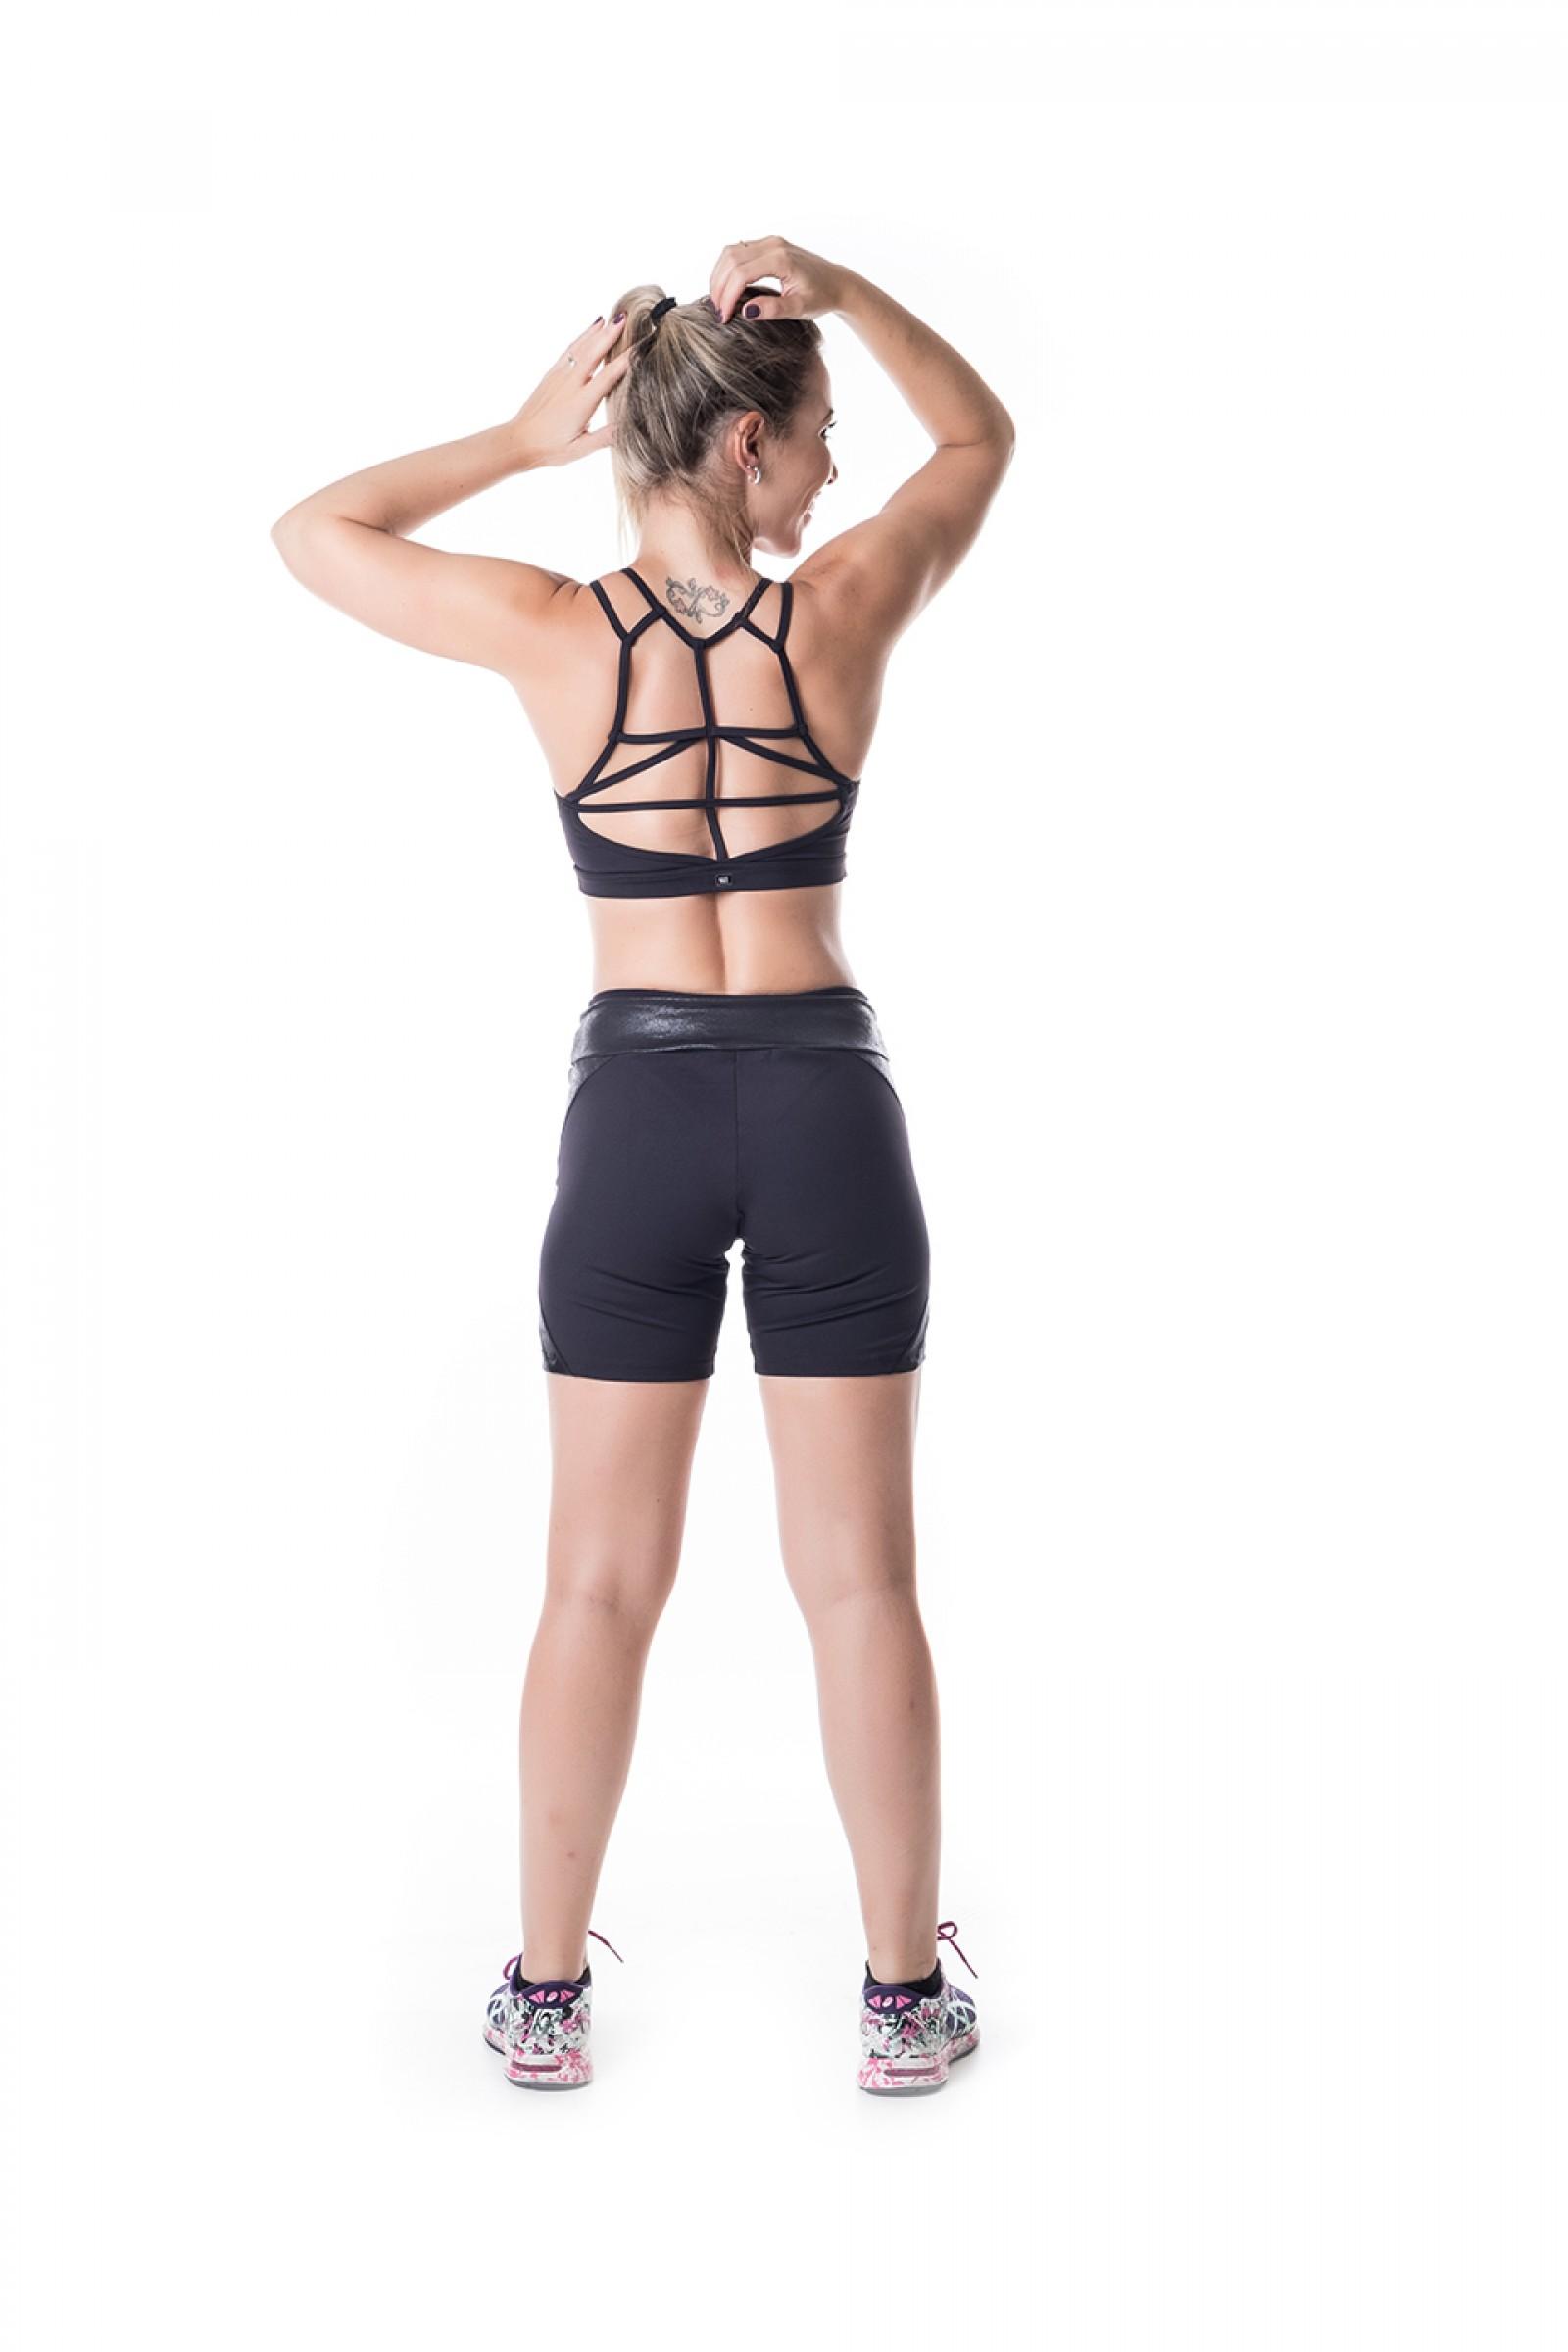 Bermuda Start preto Crak, Coleção Challenge - NKT Fitwear Moda Fitness